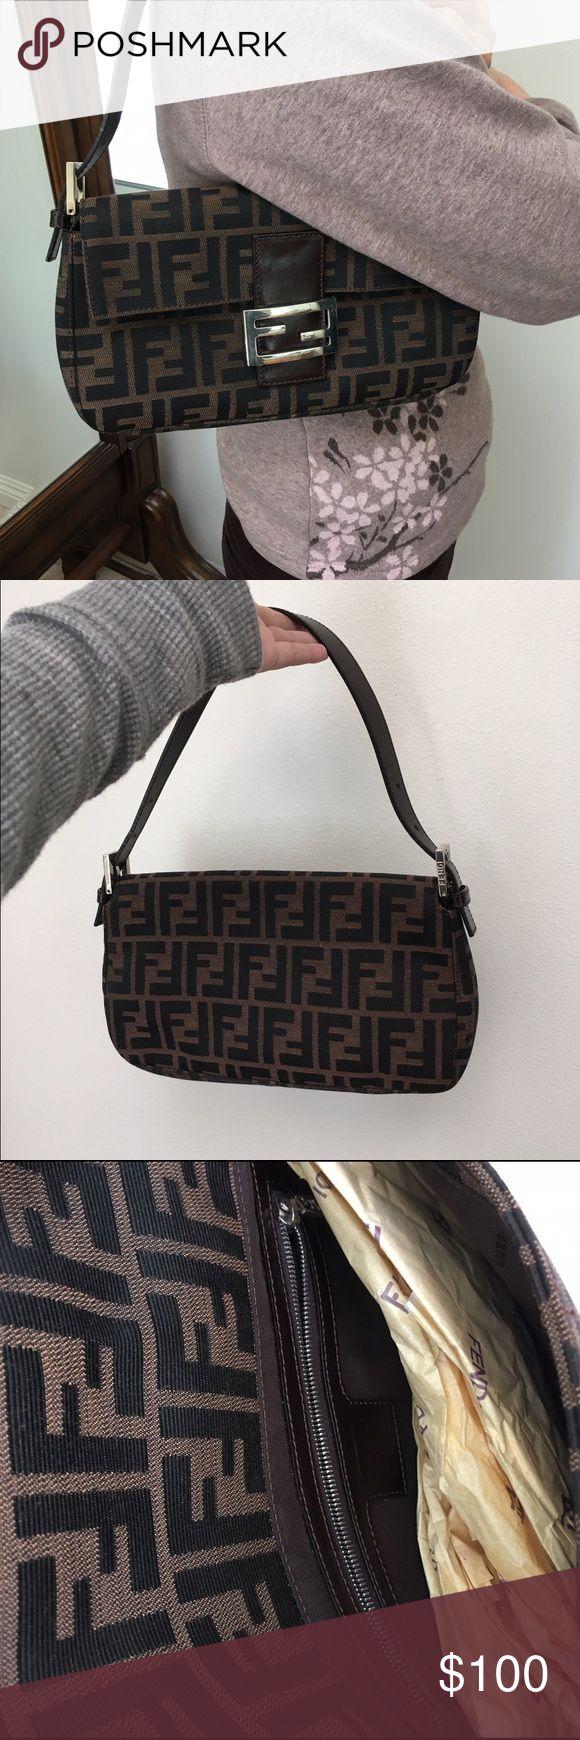 Fendi Purse Fendi Purse. Like new. With bag Fendi Bags